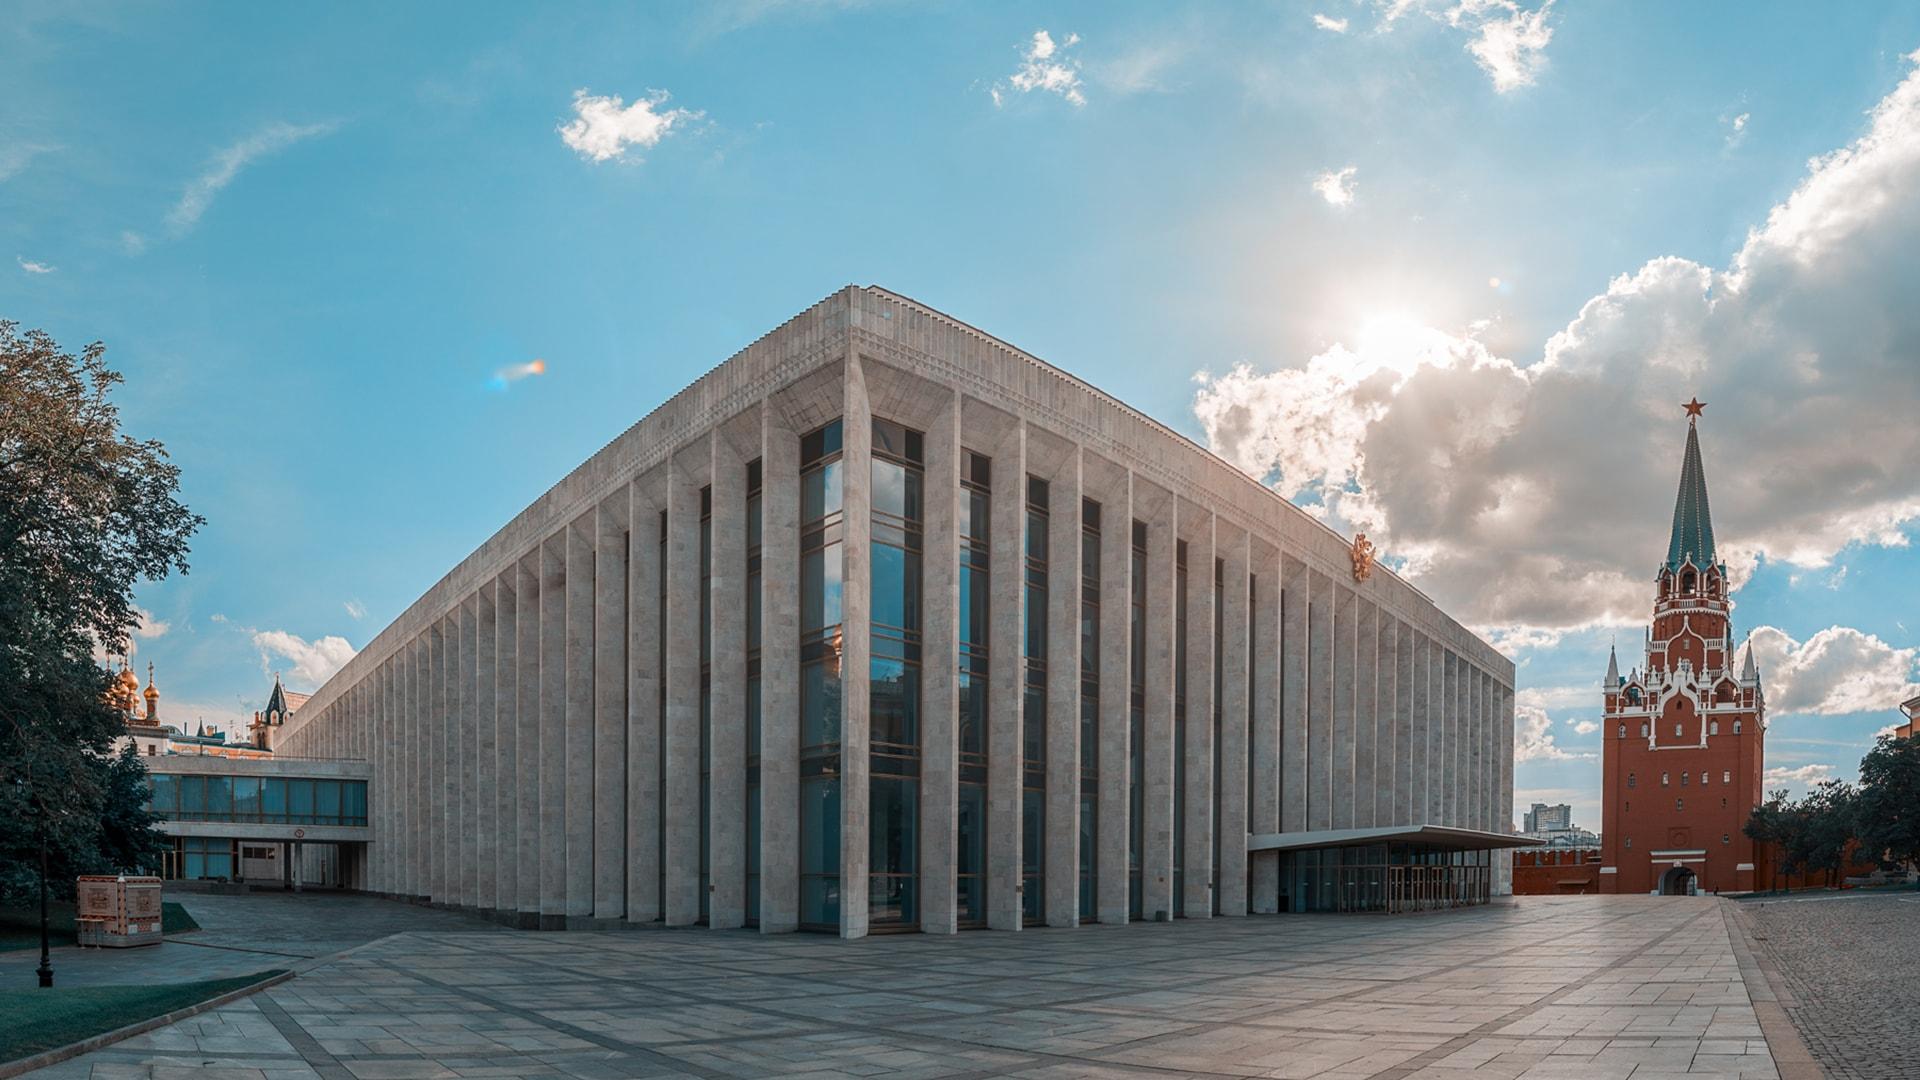 Схема проезда кремлёвский дворец съездов фото 963